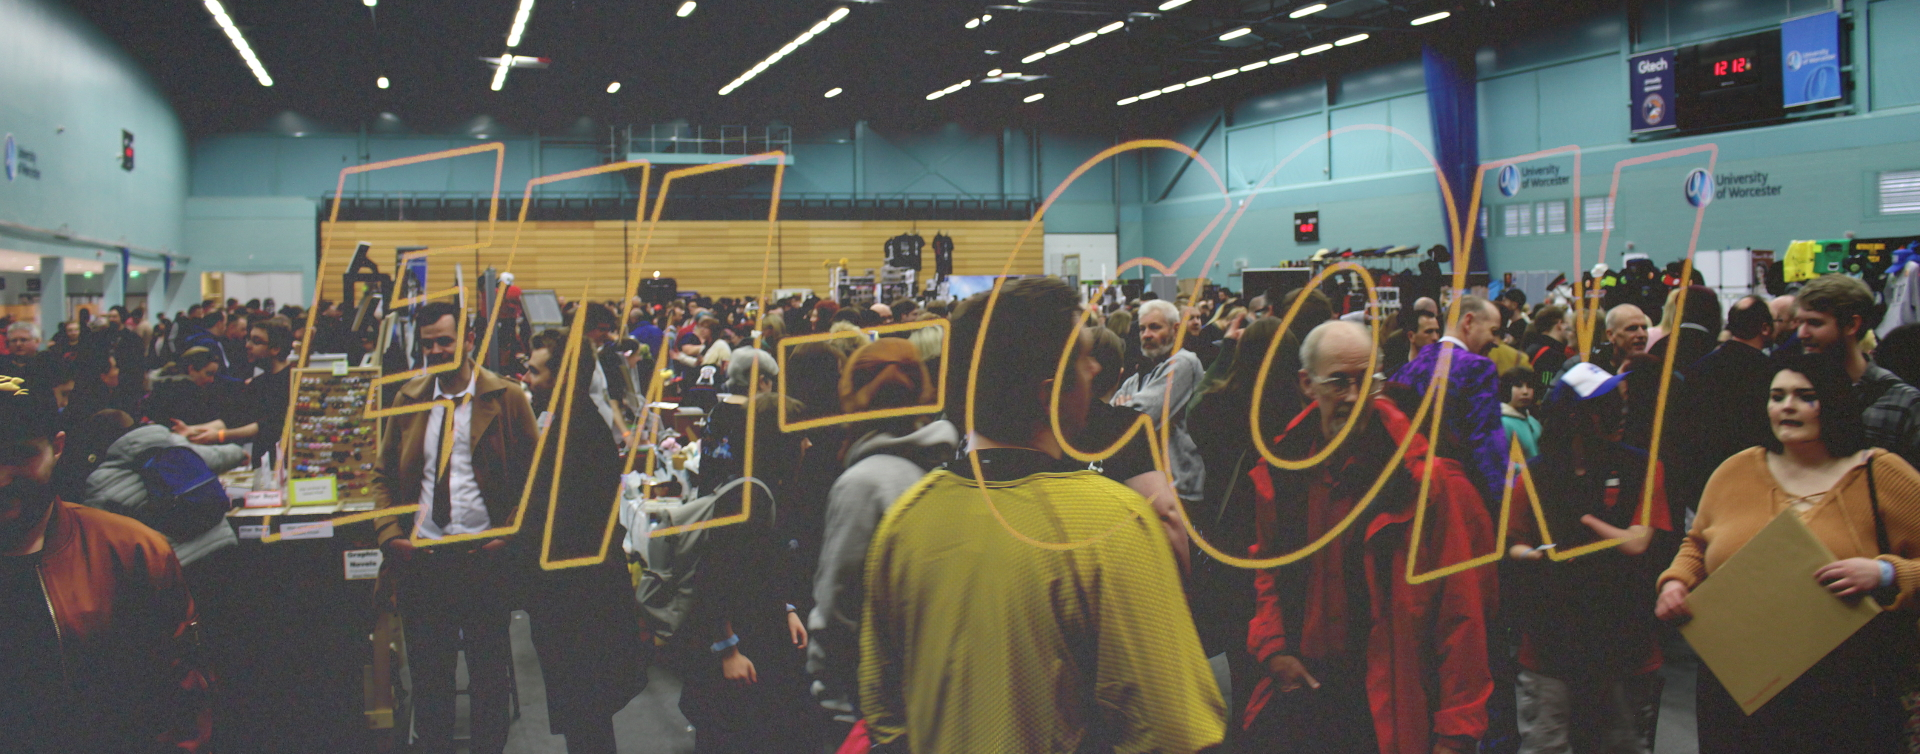 EM-Con Worcester – Event Report